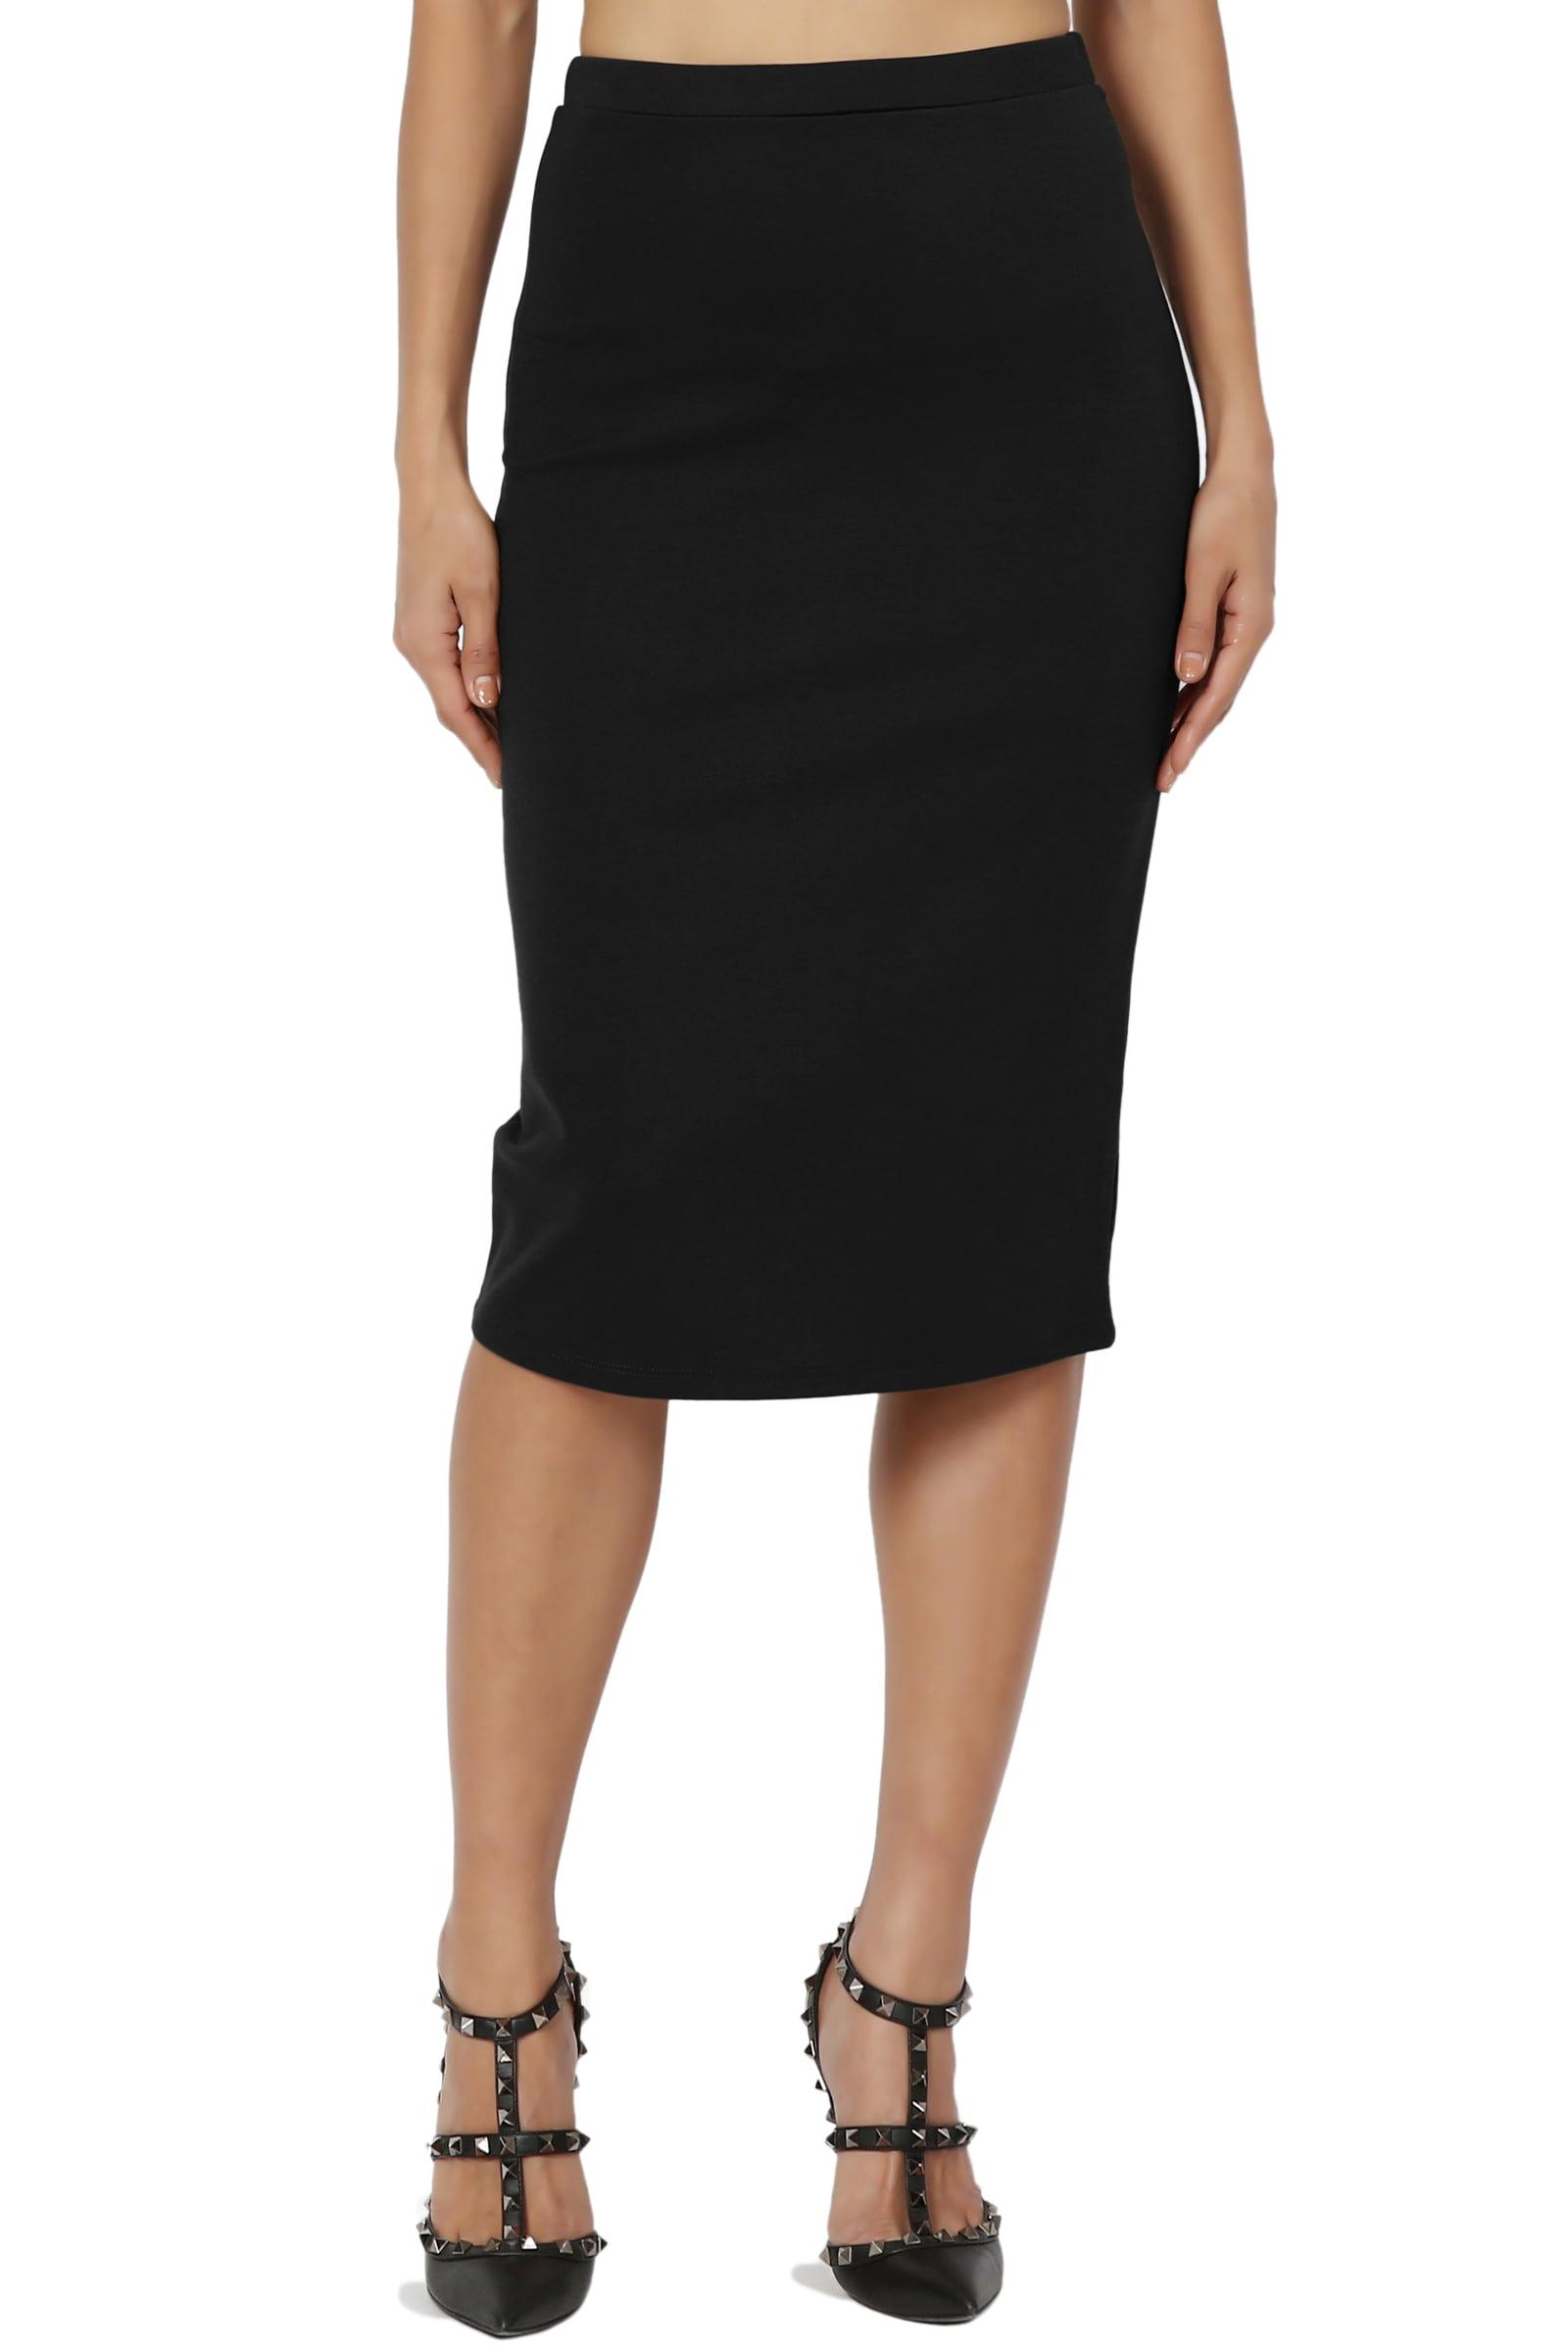 TheMogan Women's PLUS Basic Stretch Thick Ponte Knit Pencil Midi Skirt